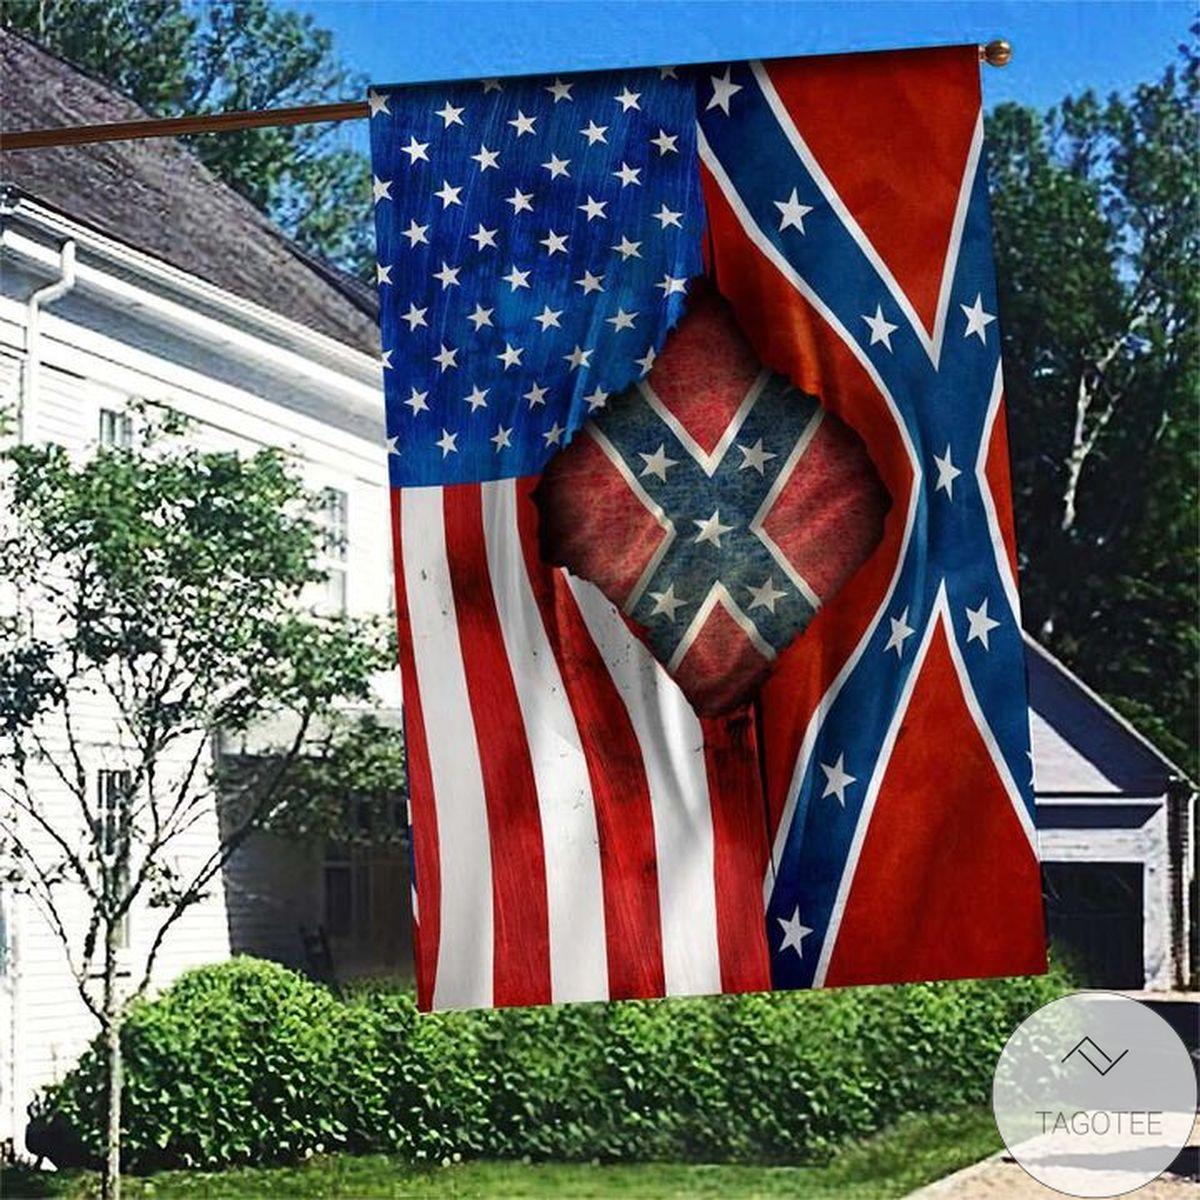 Great artwork! Confederate American Flag